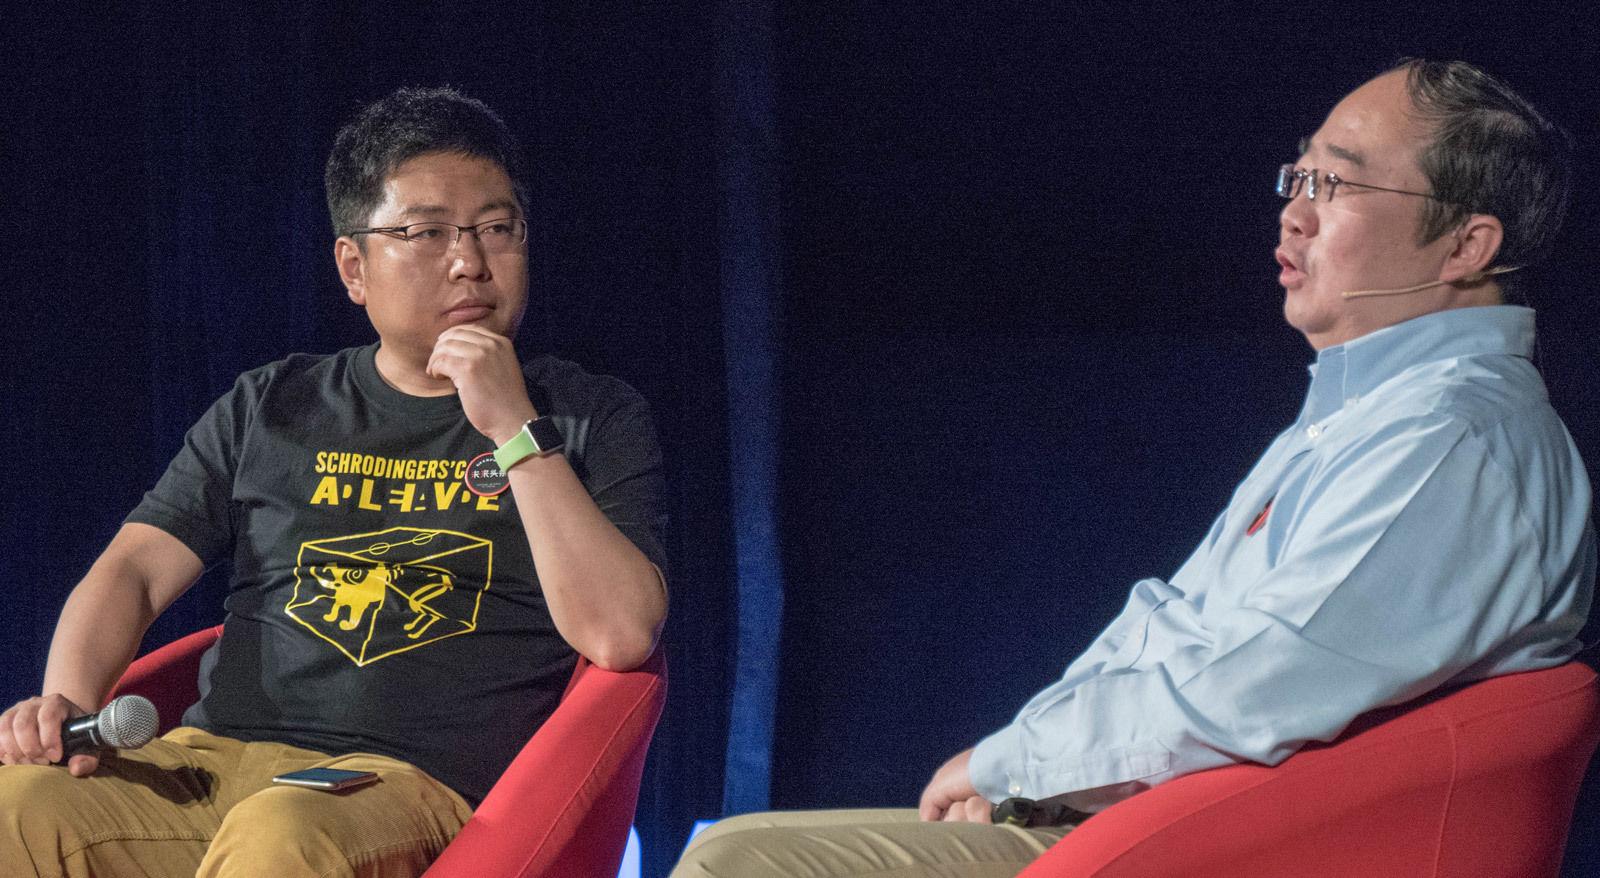 APUS 李涛:快公司的秘密